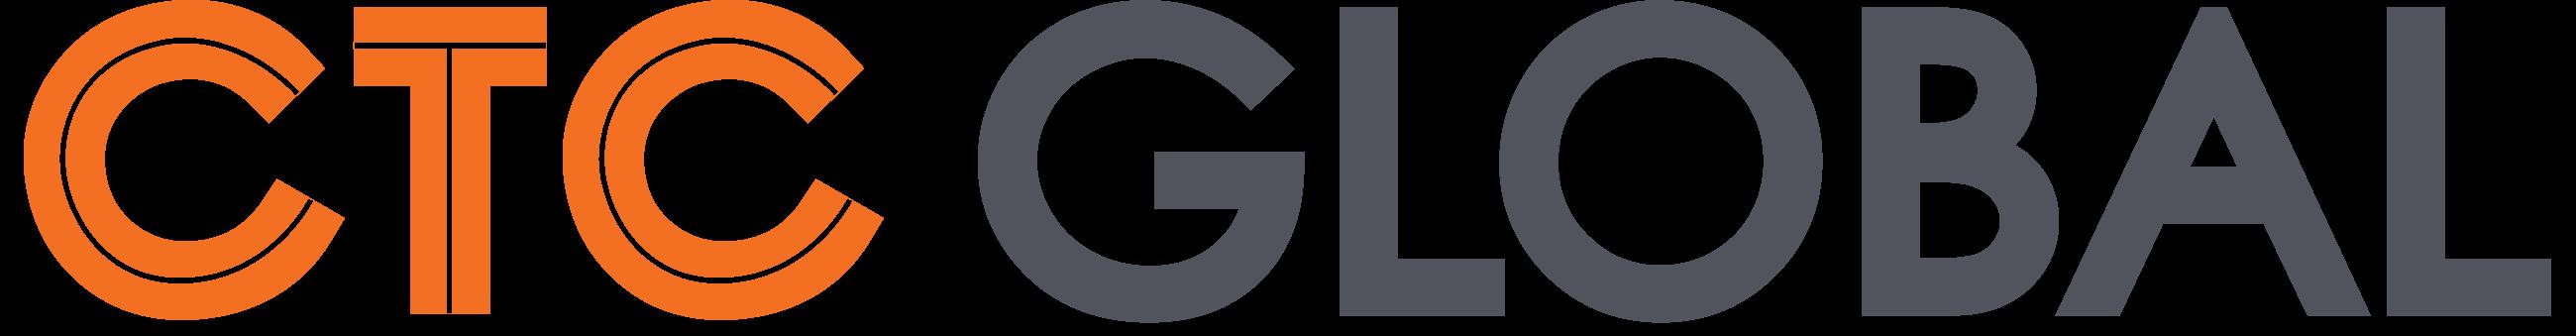 CTC Global Corporation